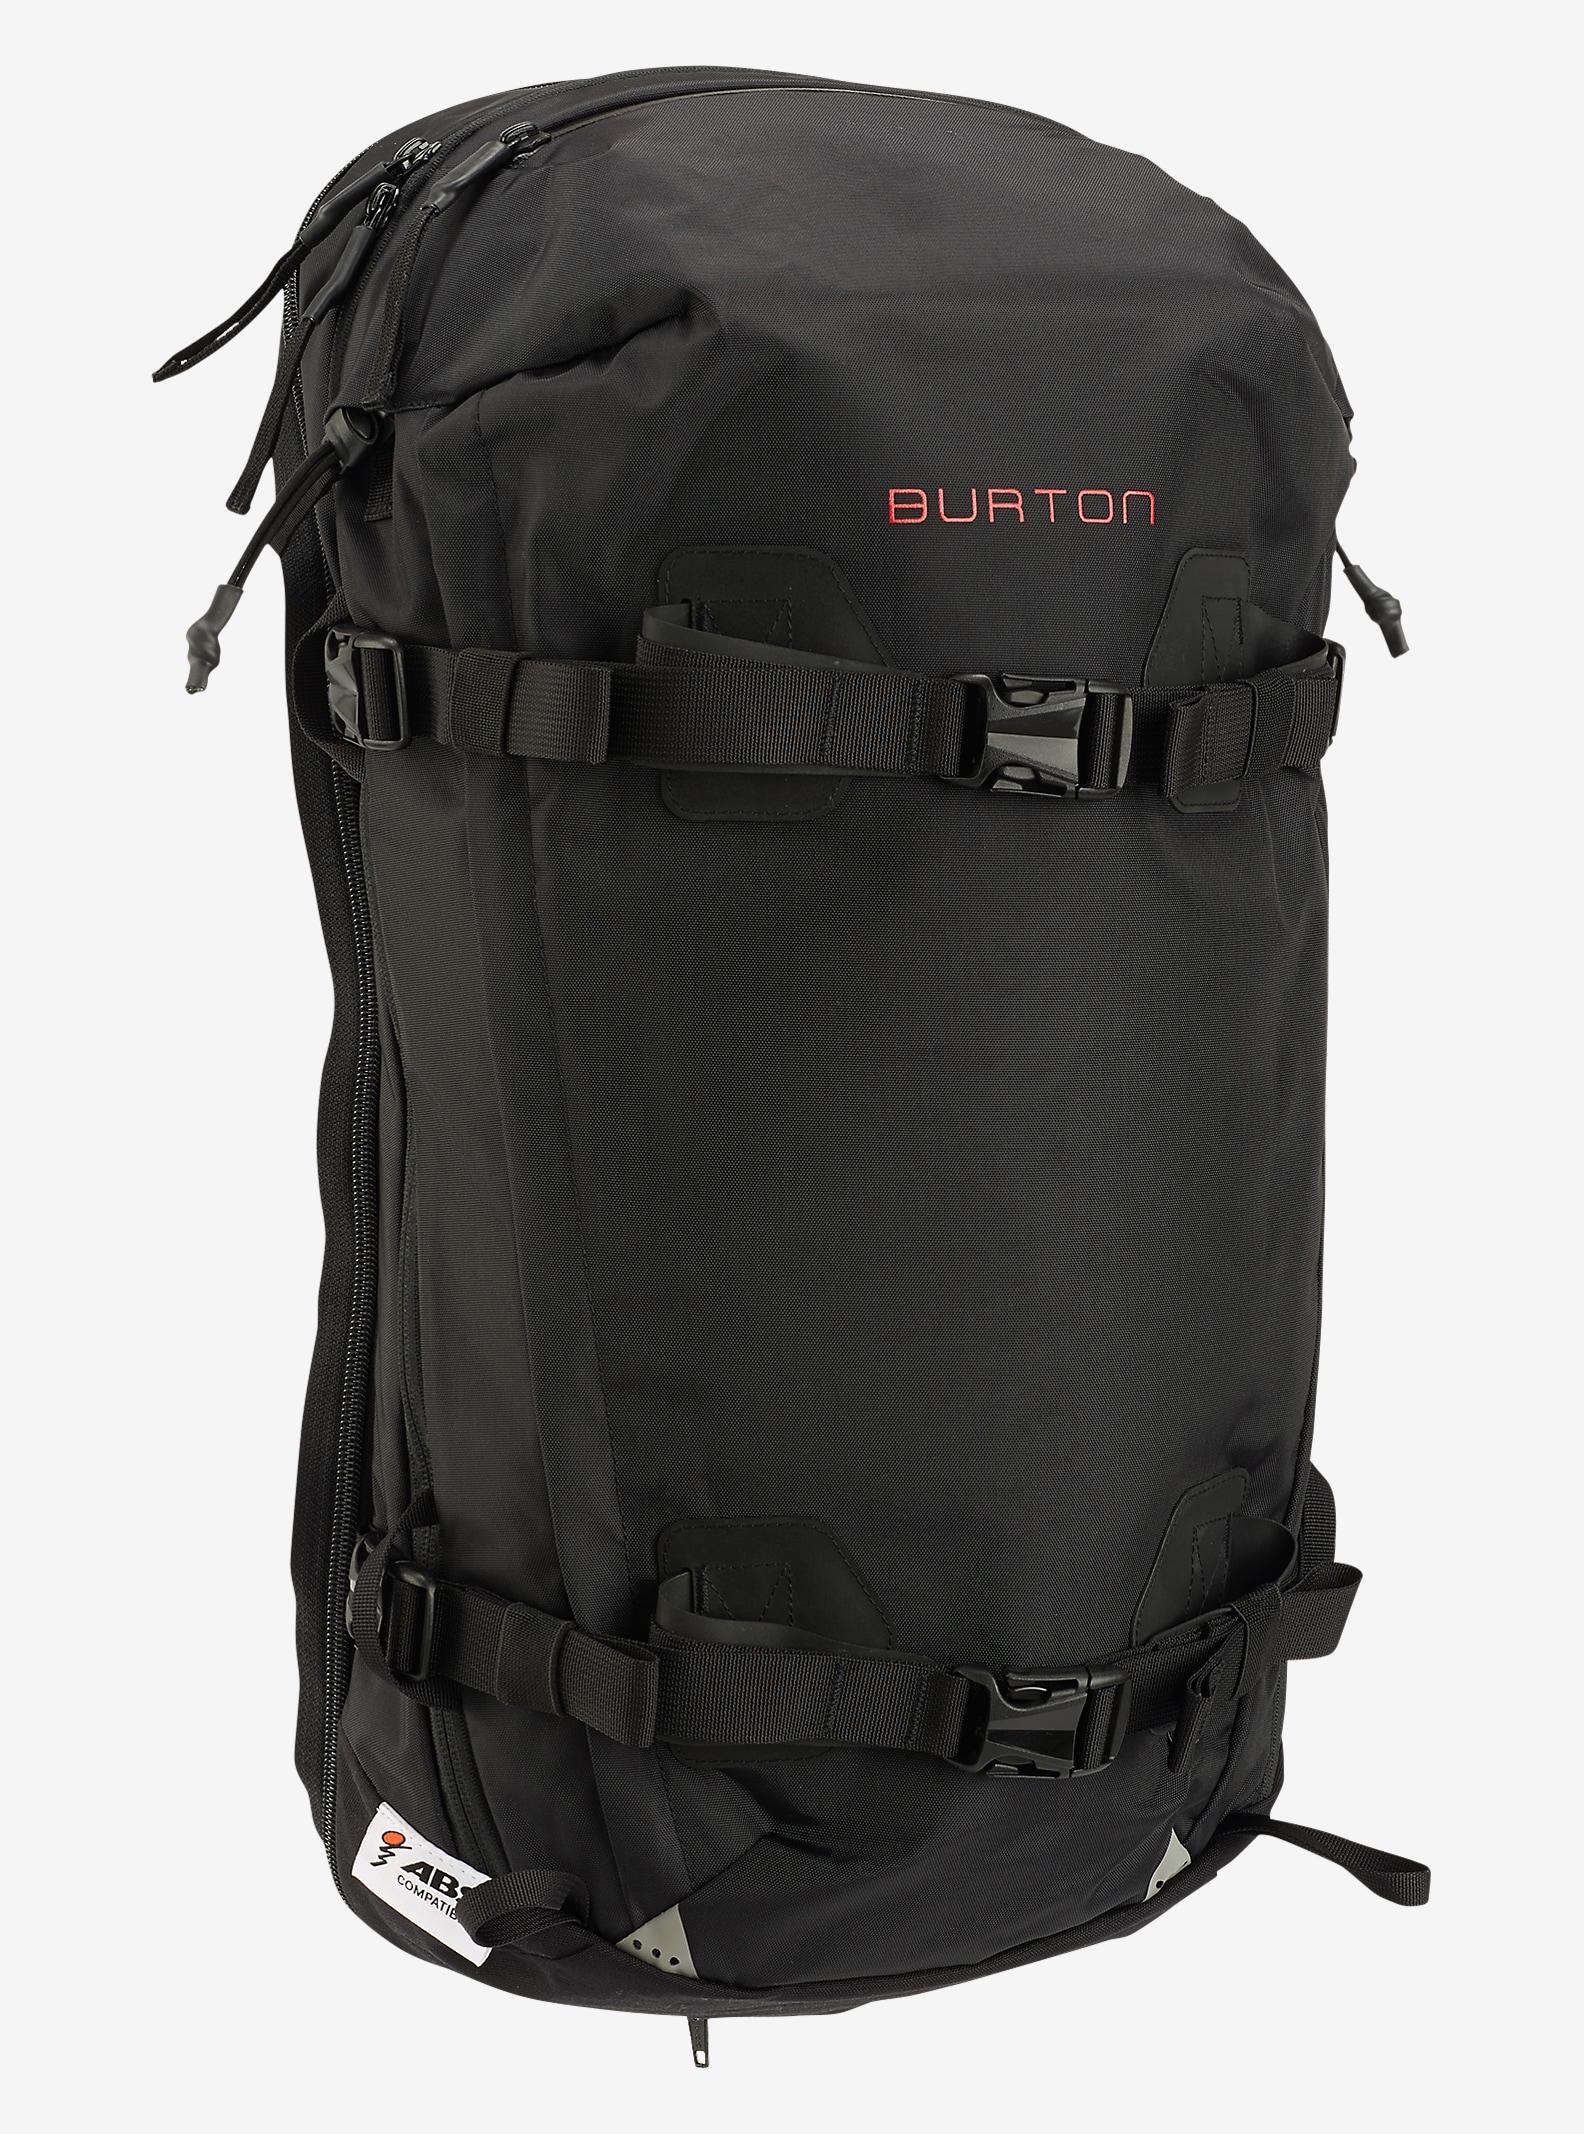 Burton ABS Vario 23L Cover shown in True Black Cordura®